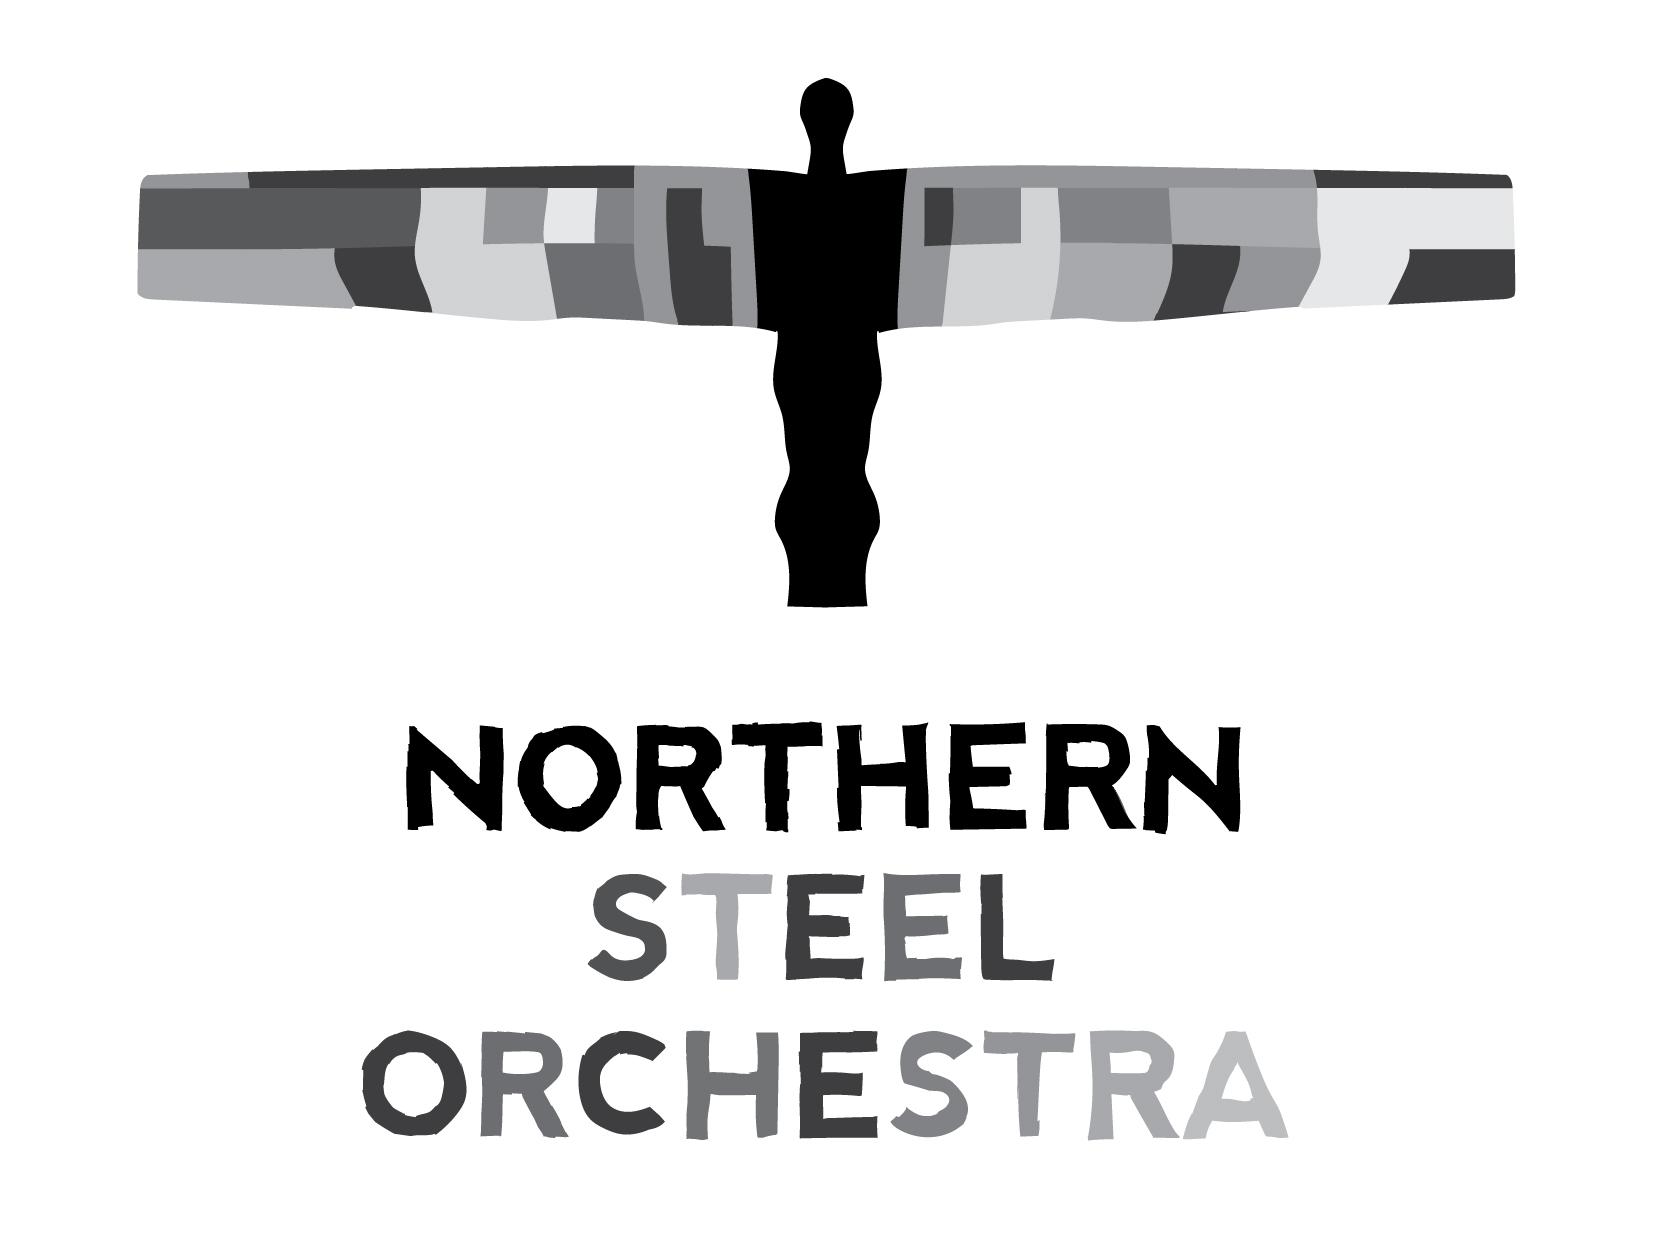 Northern_steel_orchestra-31